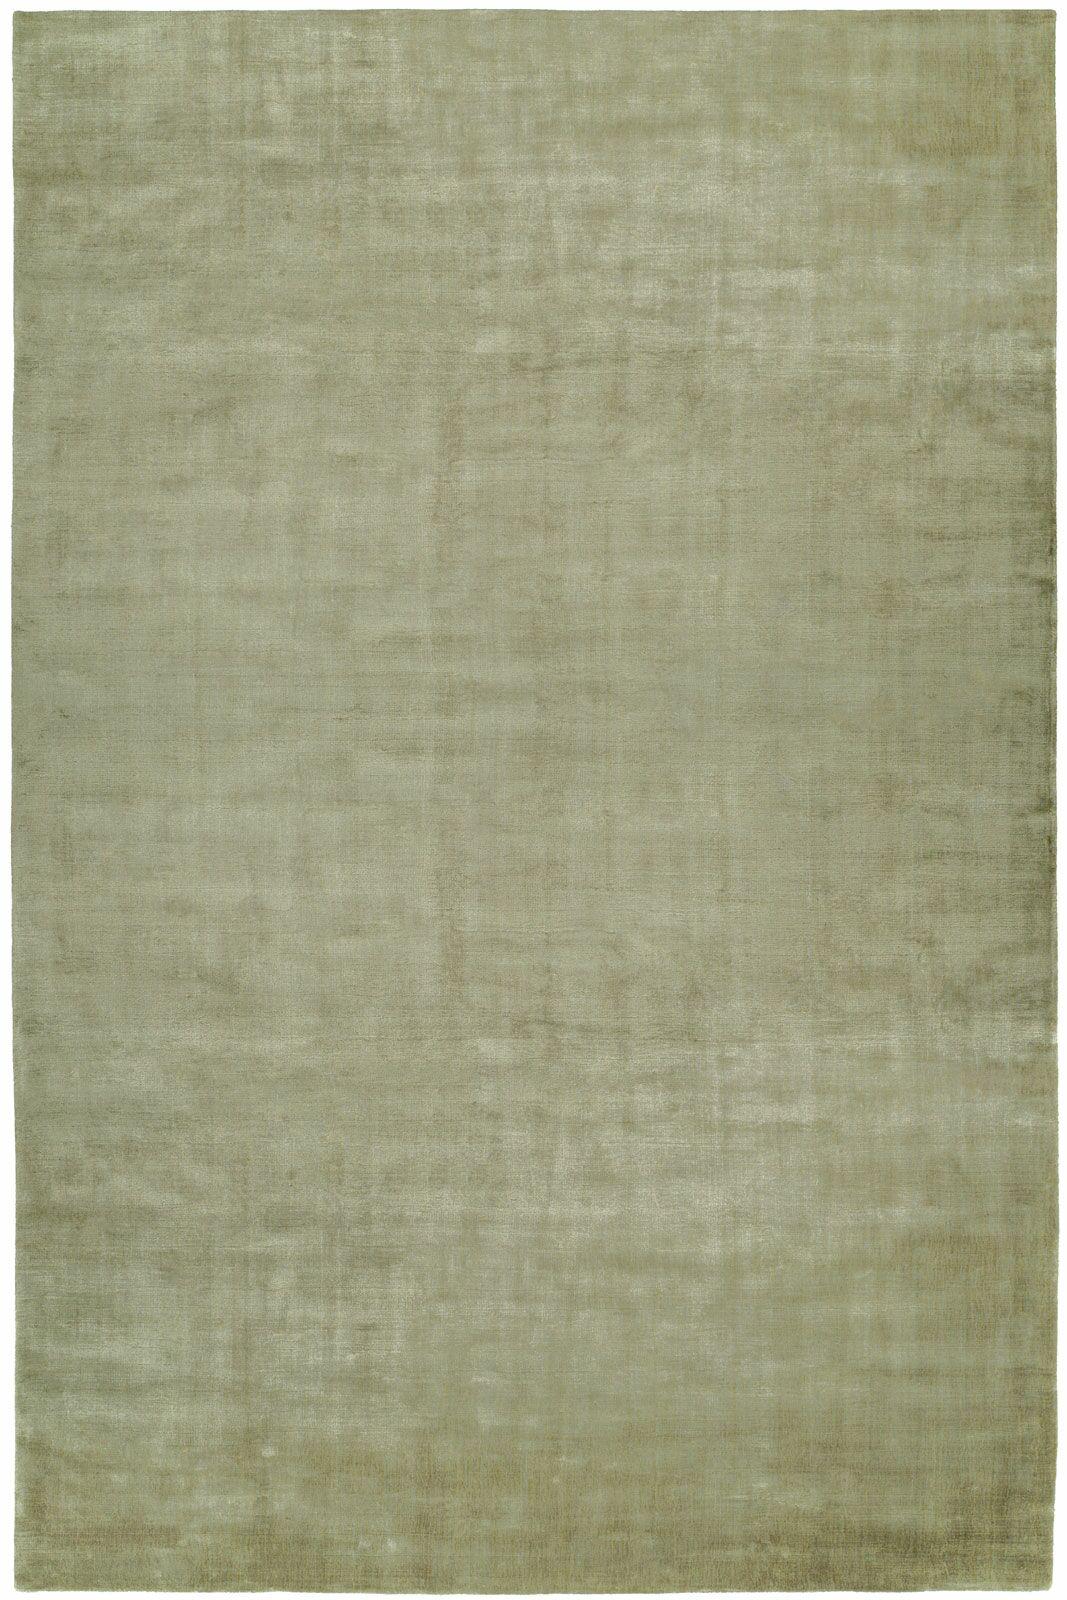 Bhatia Hand-Woven Green Area Rug Rug Size: 8' x 10'